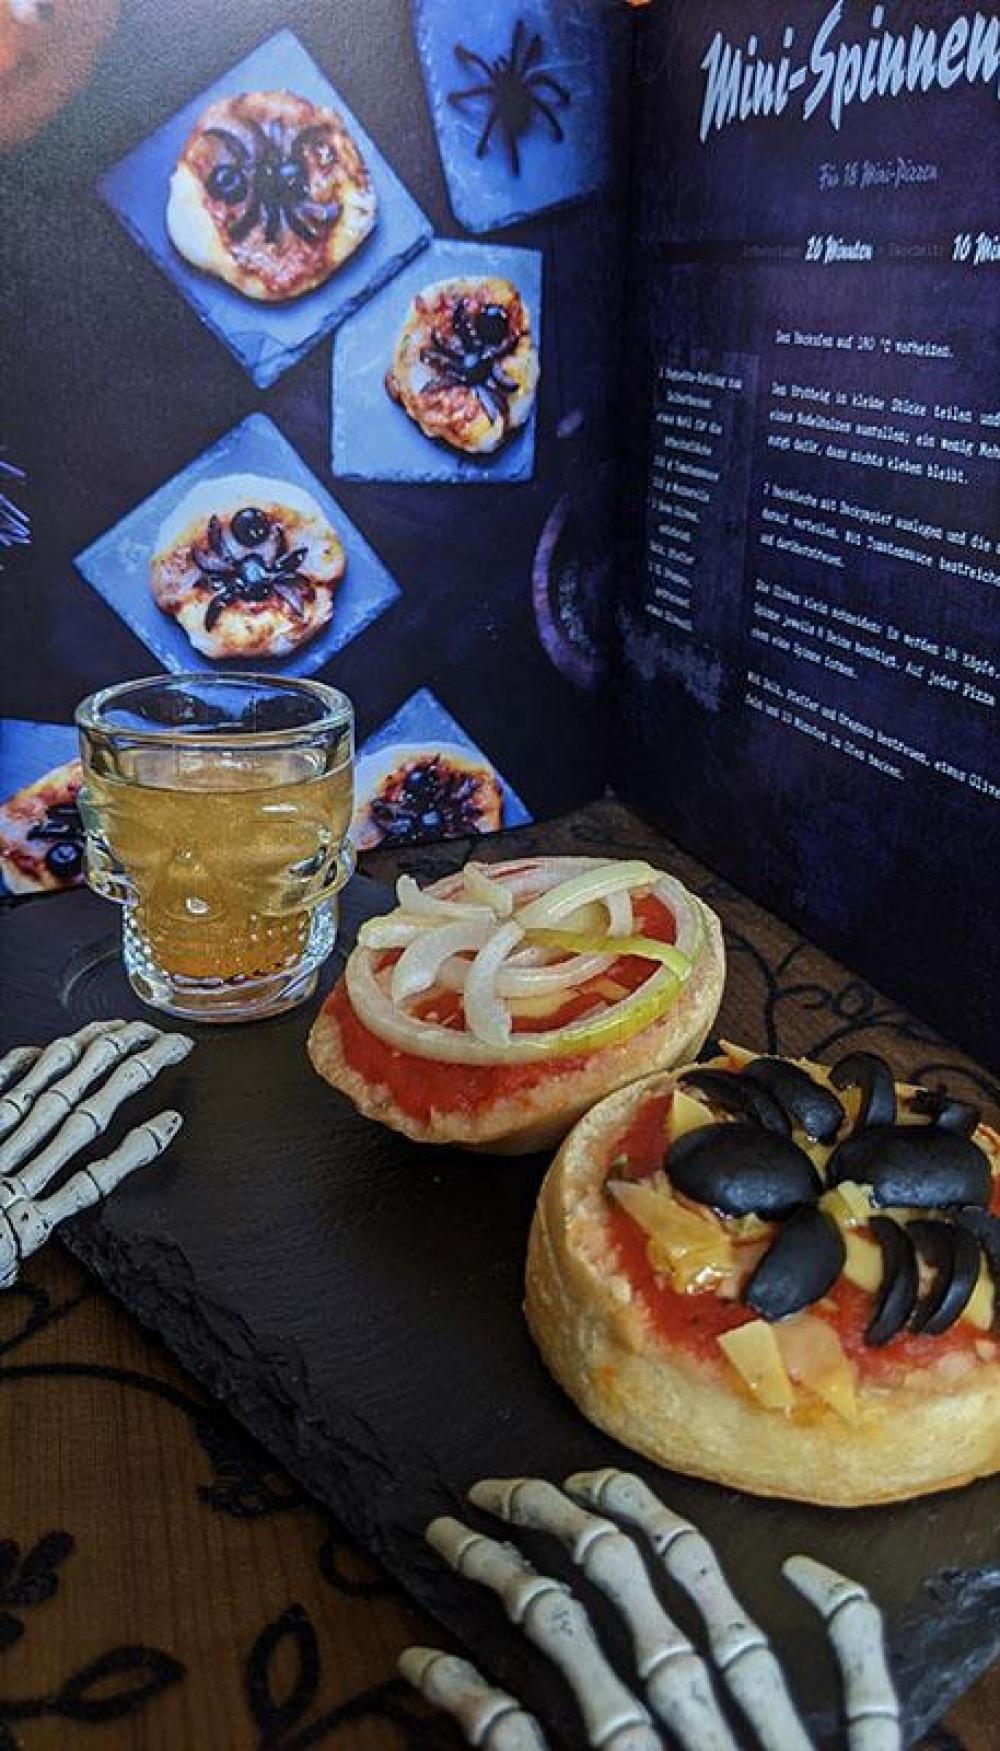 Spinnen-Pizza